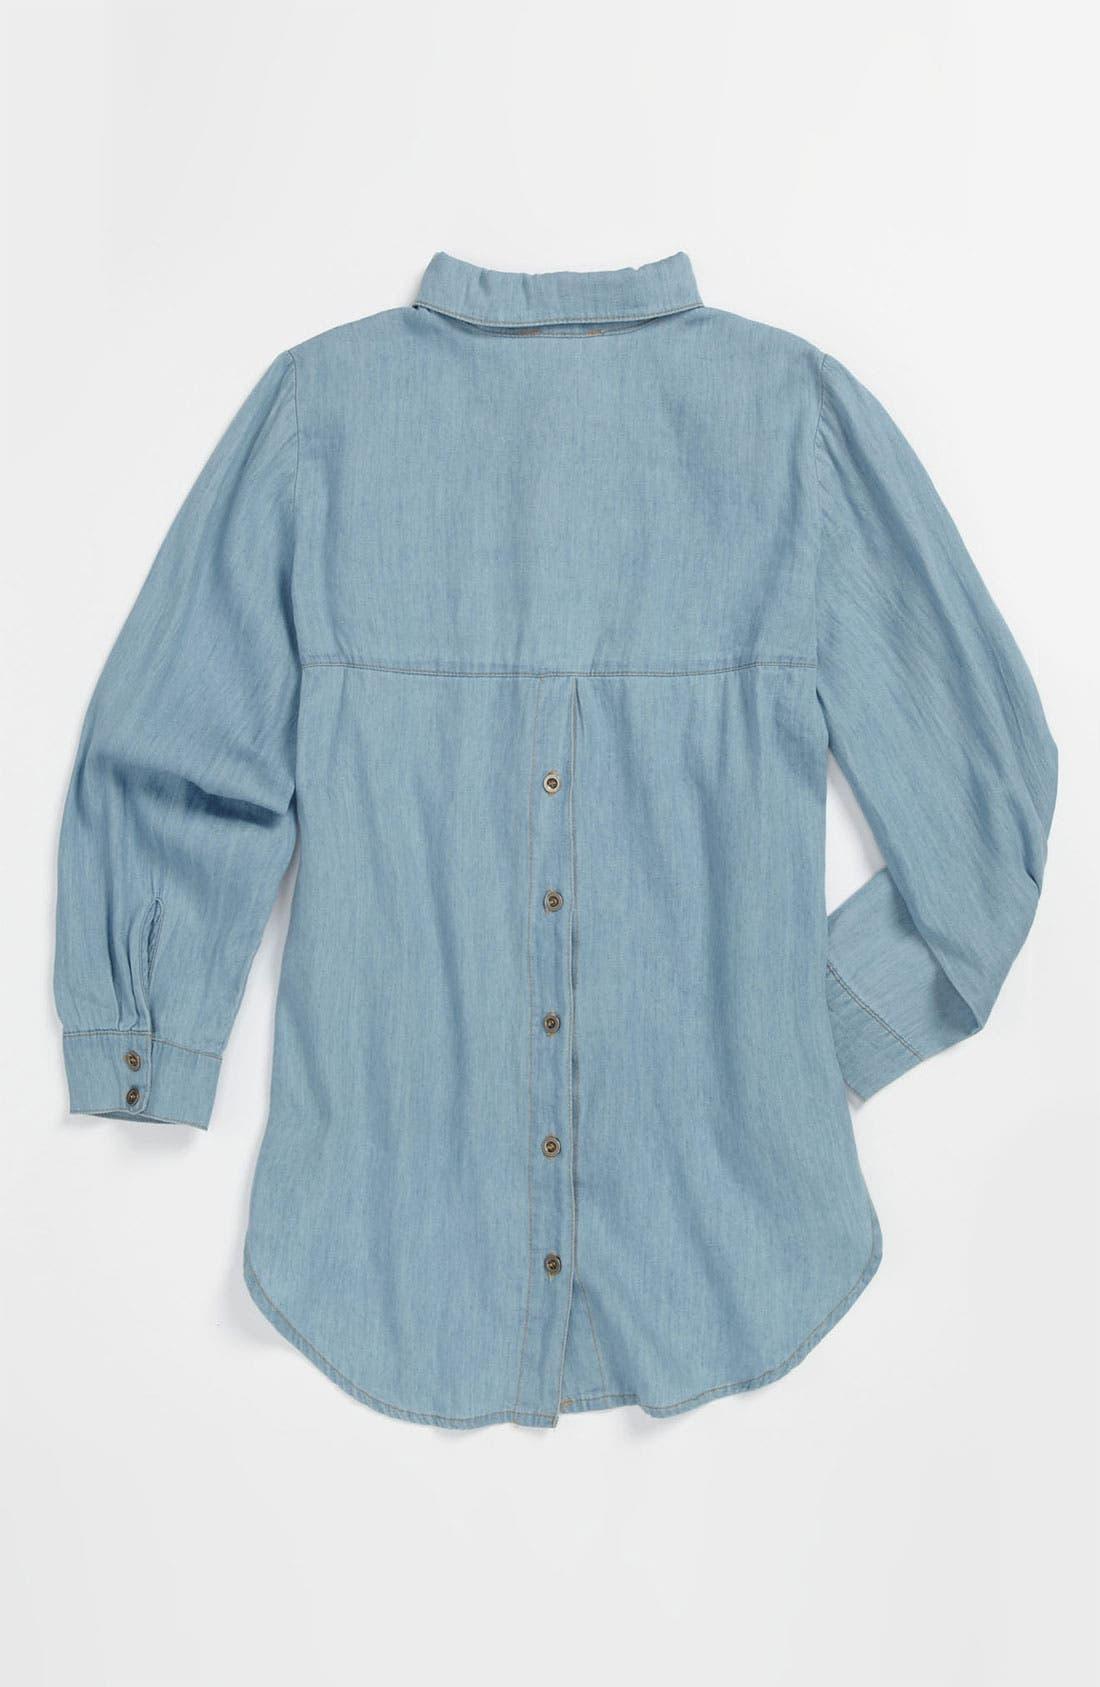 Alternate Image 2  - Mia Chica Chambray Shirt (Big Girls)